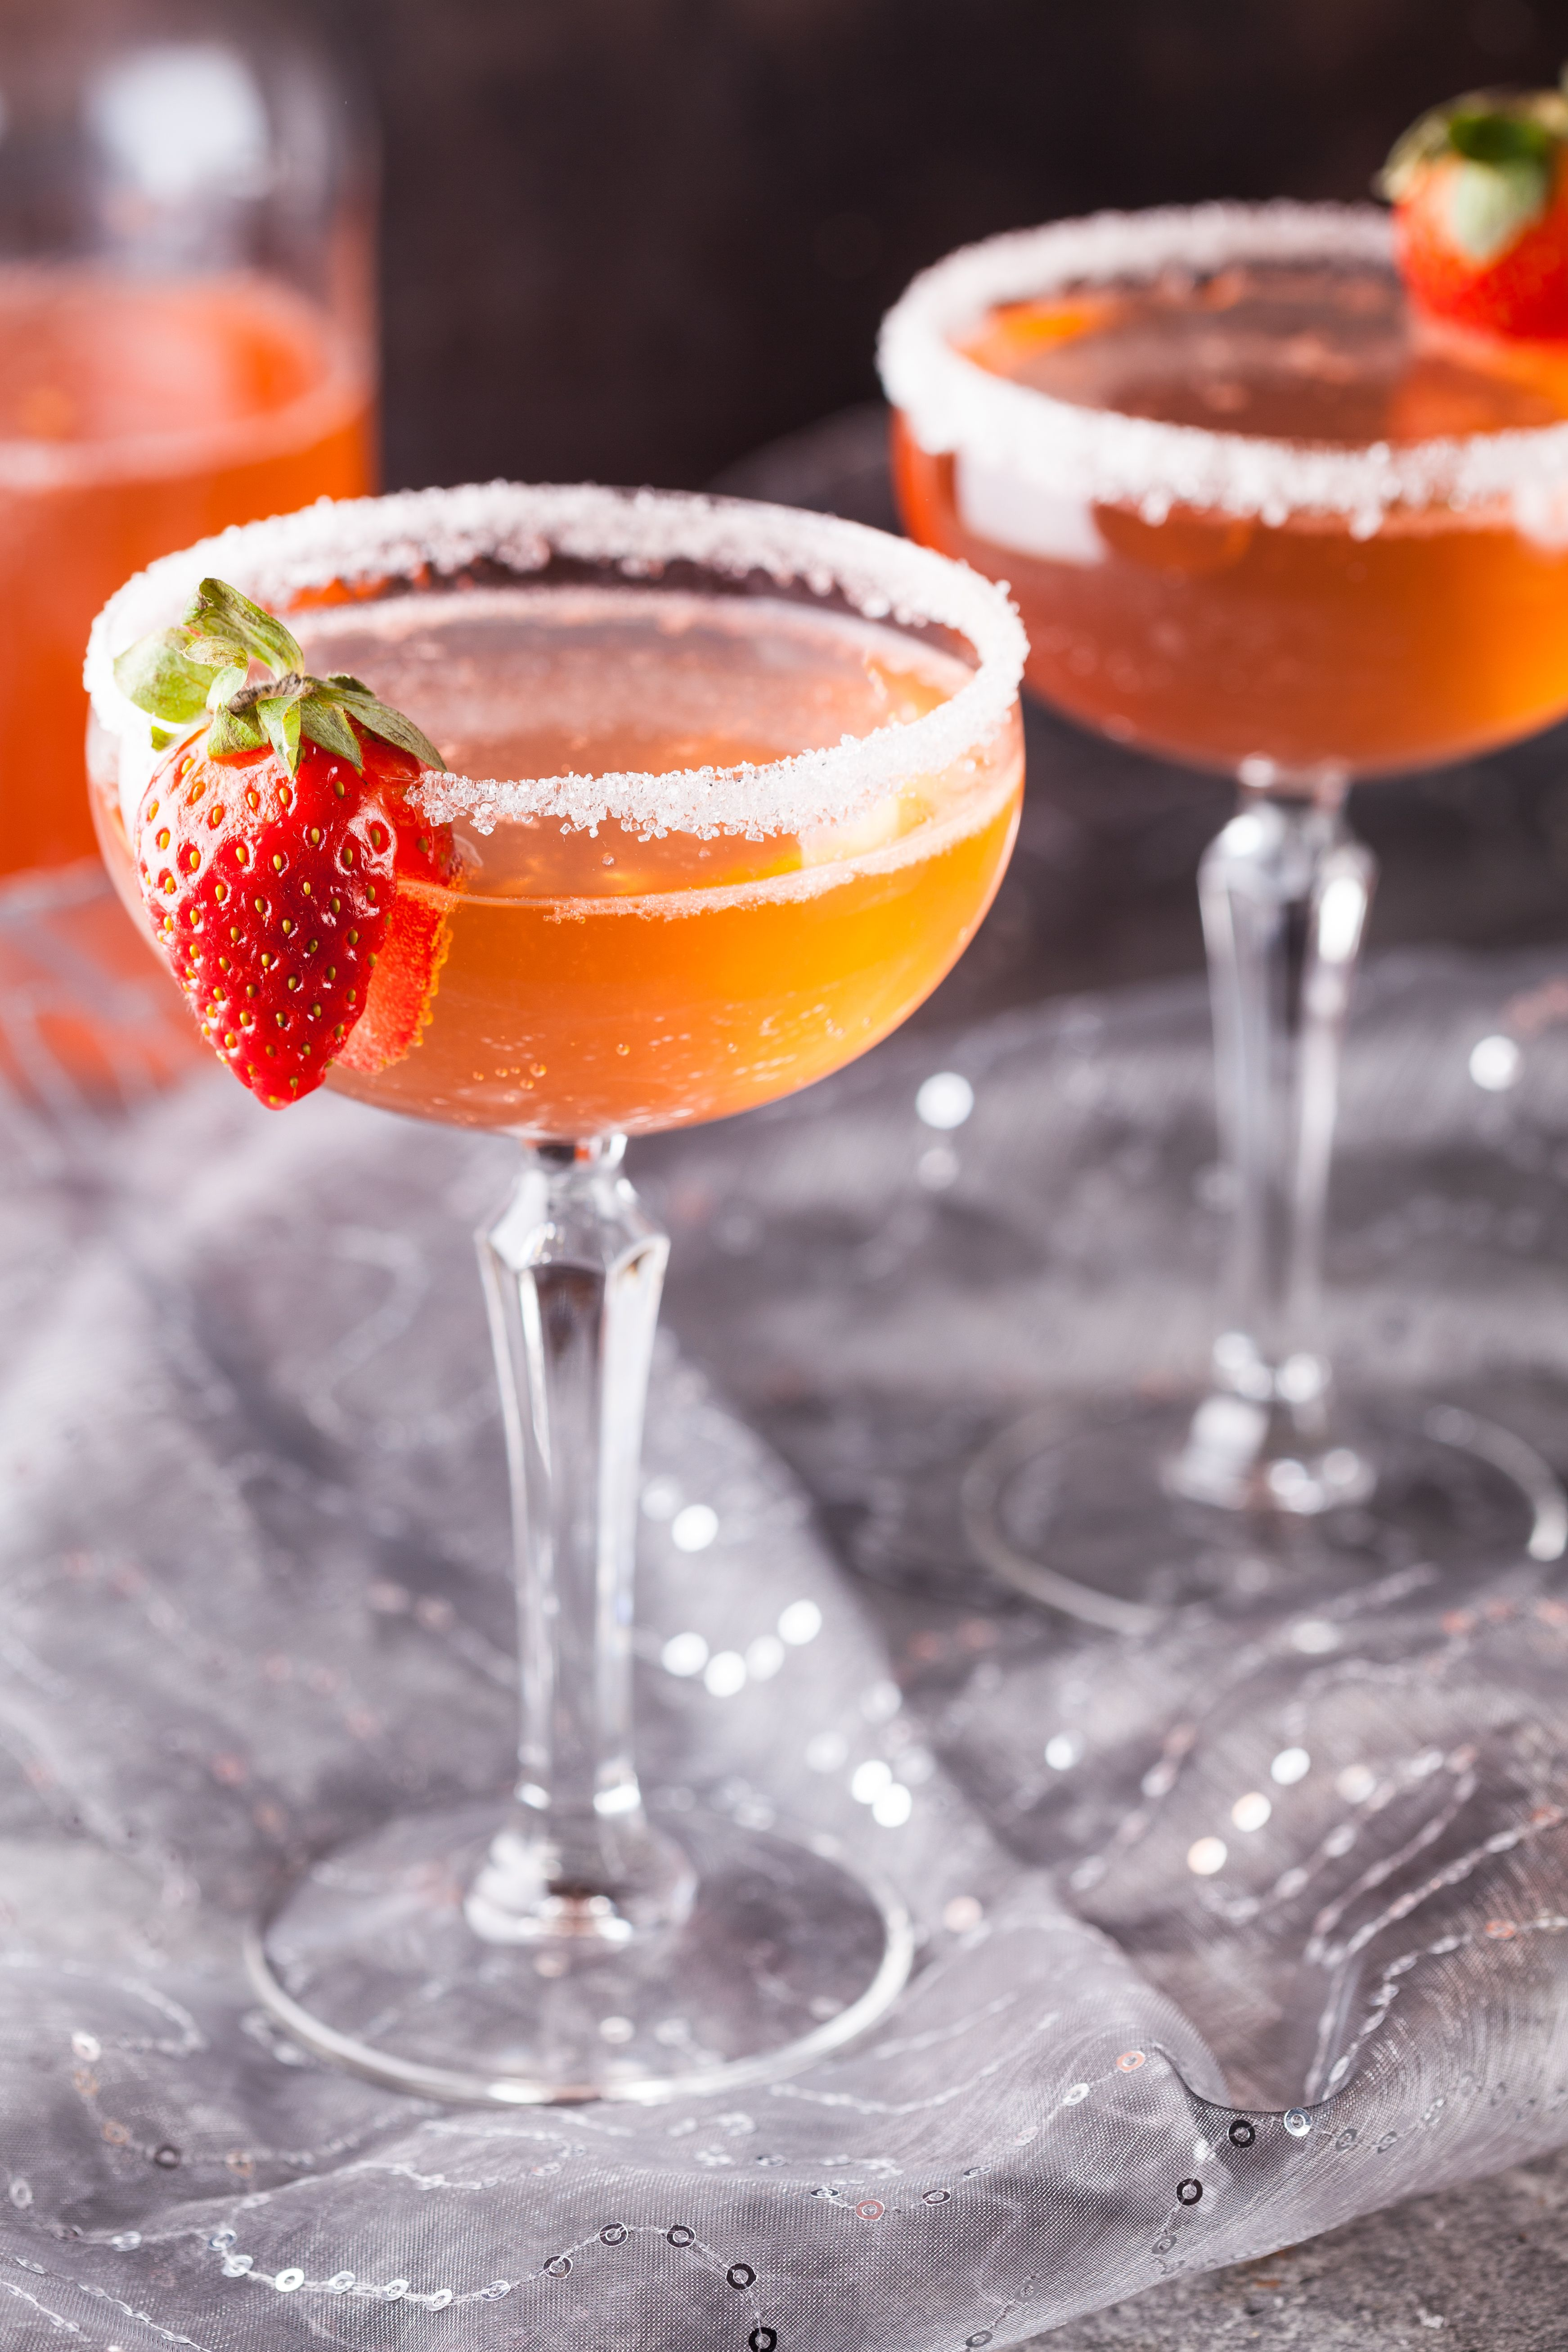 Rose Water Strawberry Lemonade عصير الليمون بالفراولة وماء الورد Traditional Bread Recipe Juicing Lemons Strawberry Lemonade